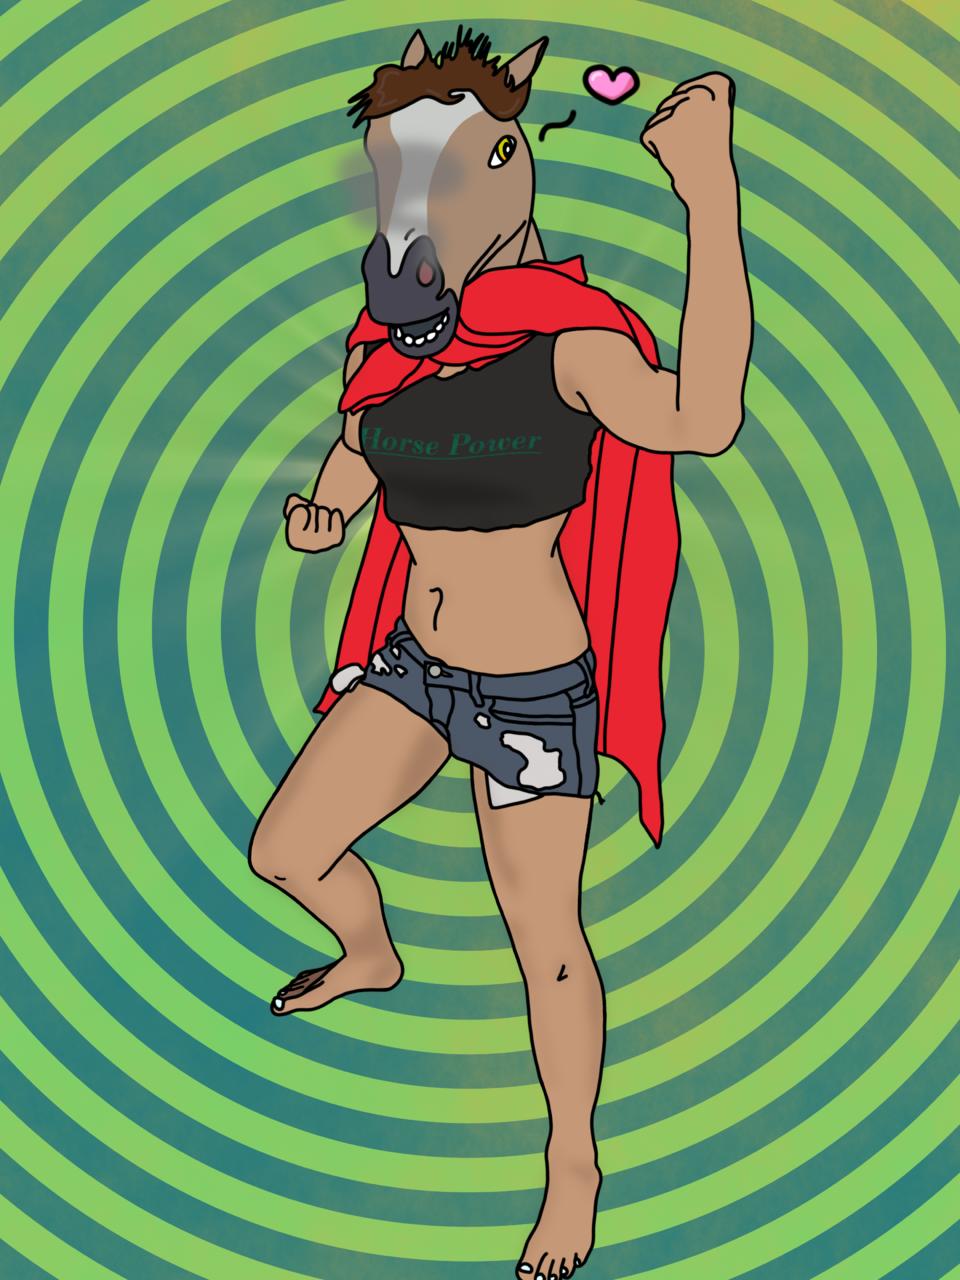 Why the Long Face? Illust of CopperNeon comedy September2020_Contest:Furry MyIdealWaifu_MyIdealHusbandoContest MyIdealWaifu cute Horse girl Halloween love anime hero cartoon funny